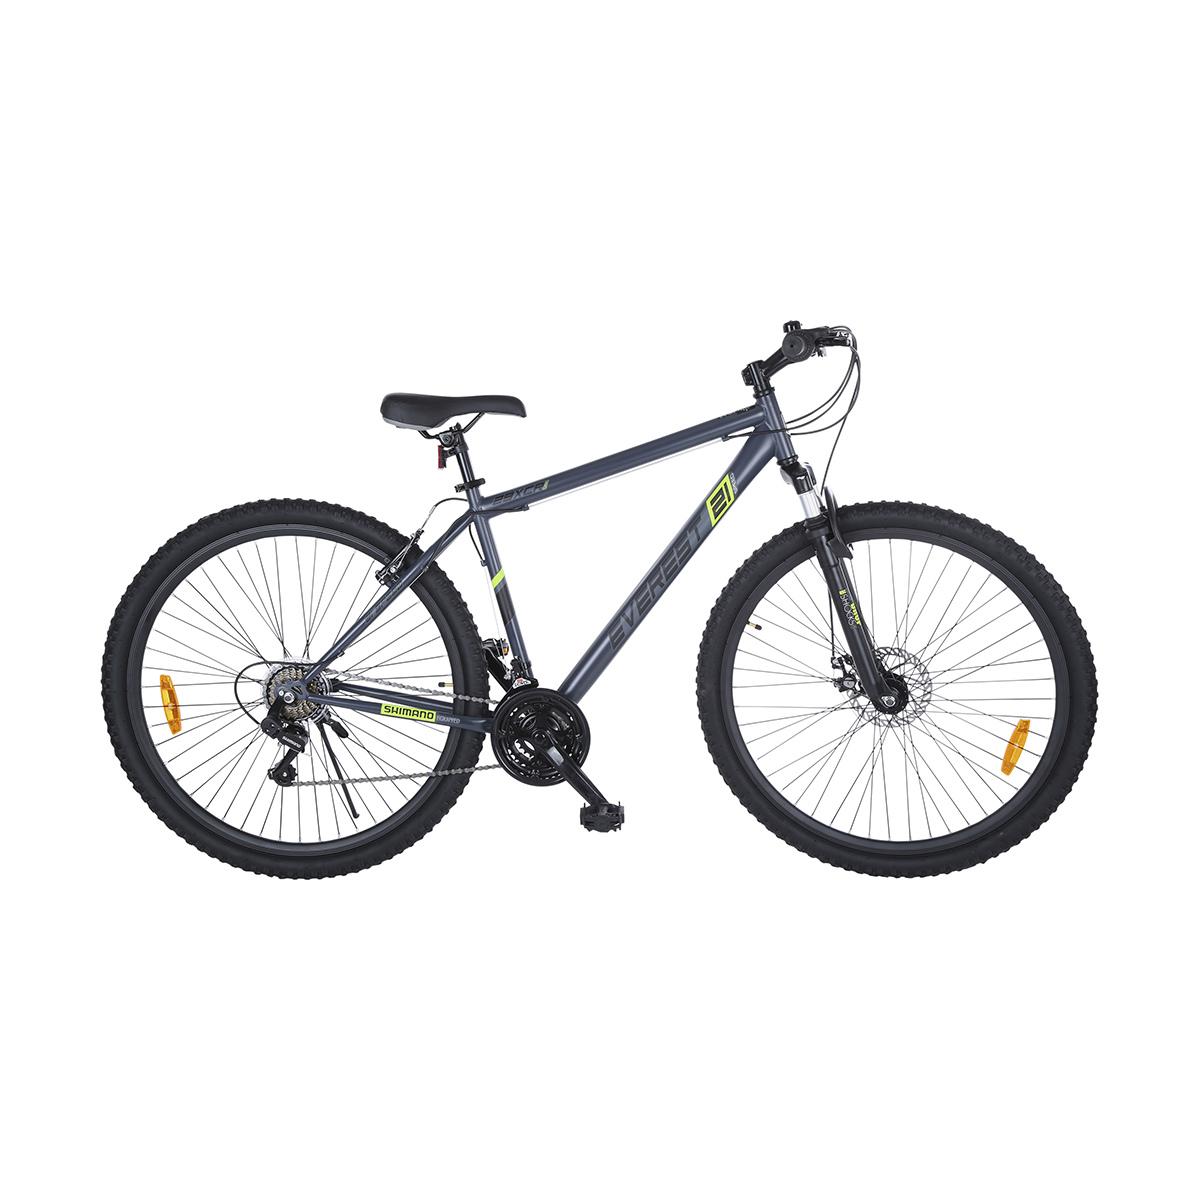 8972575c9ff 74cm Everest Mountain Bike. $149.00. This 21 speed ...